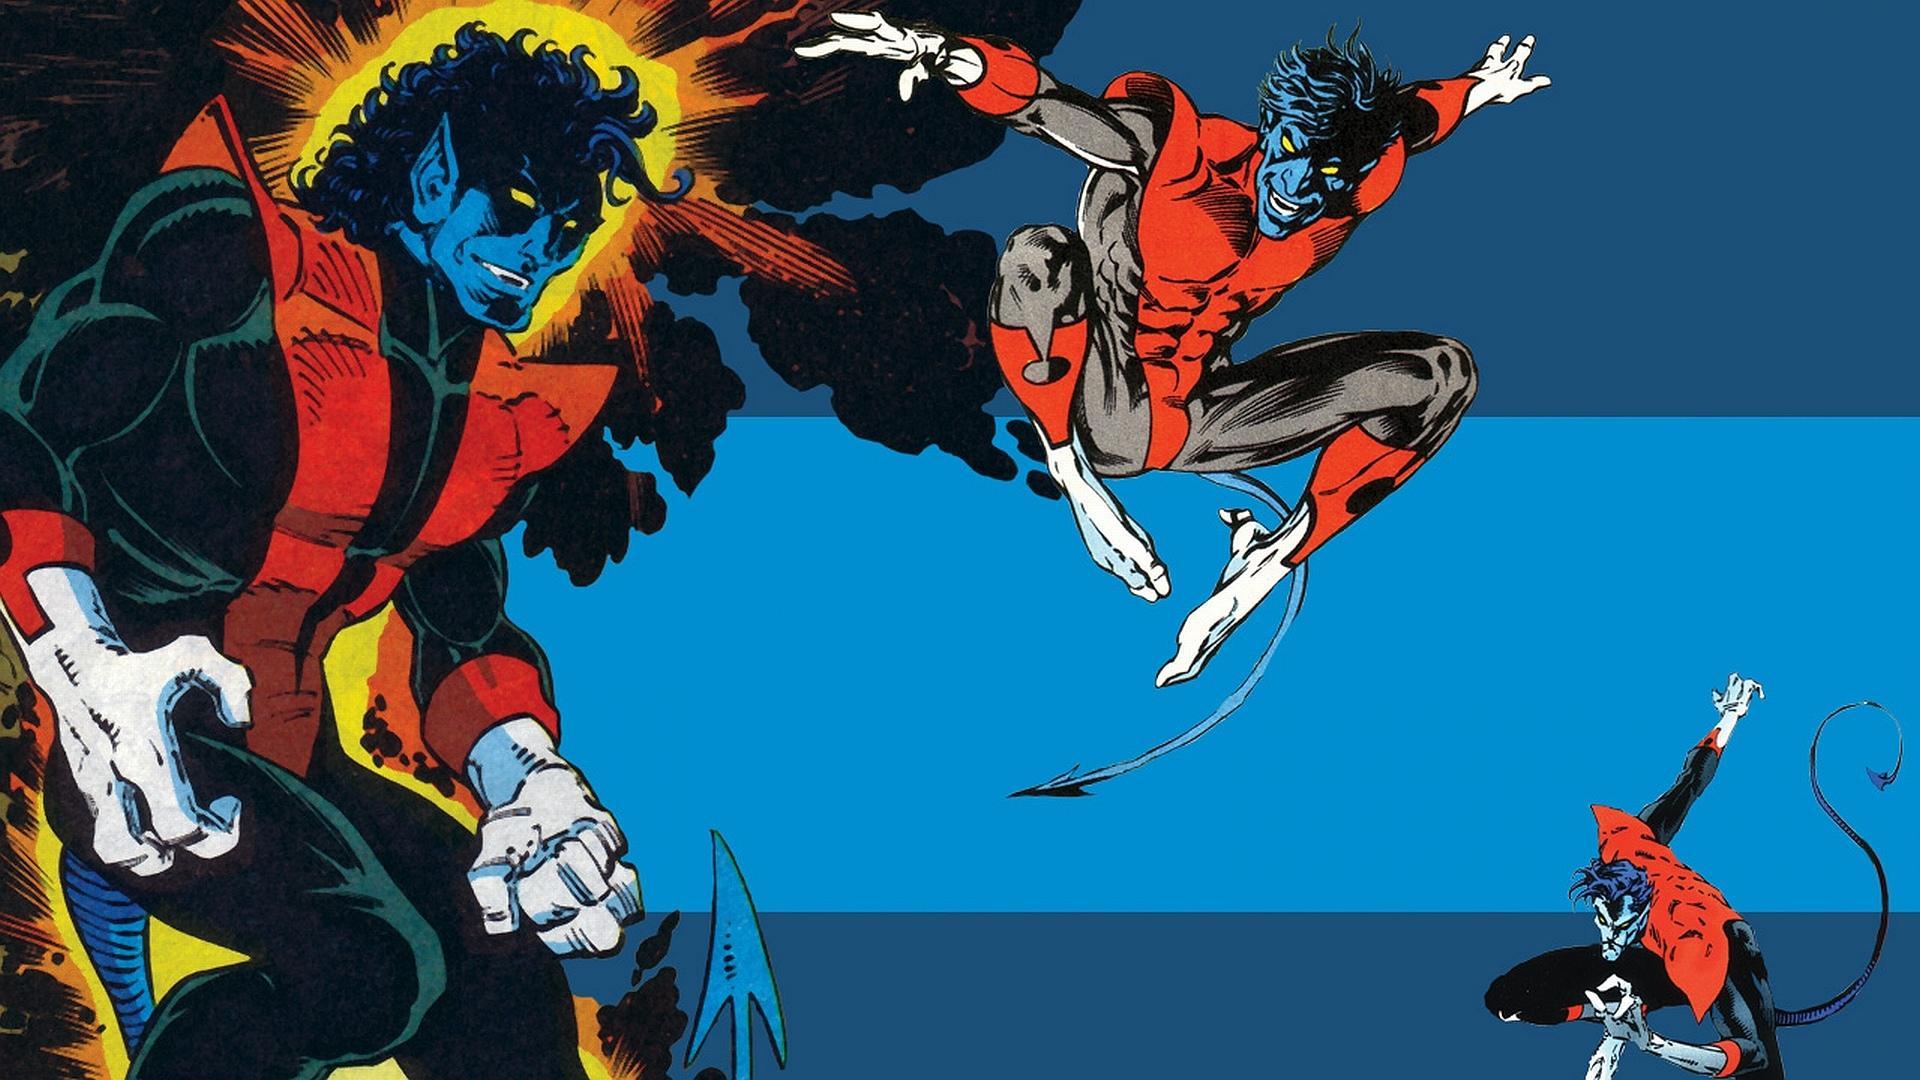 Nightcrawler Comics wallpapers HD quality